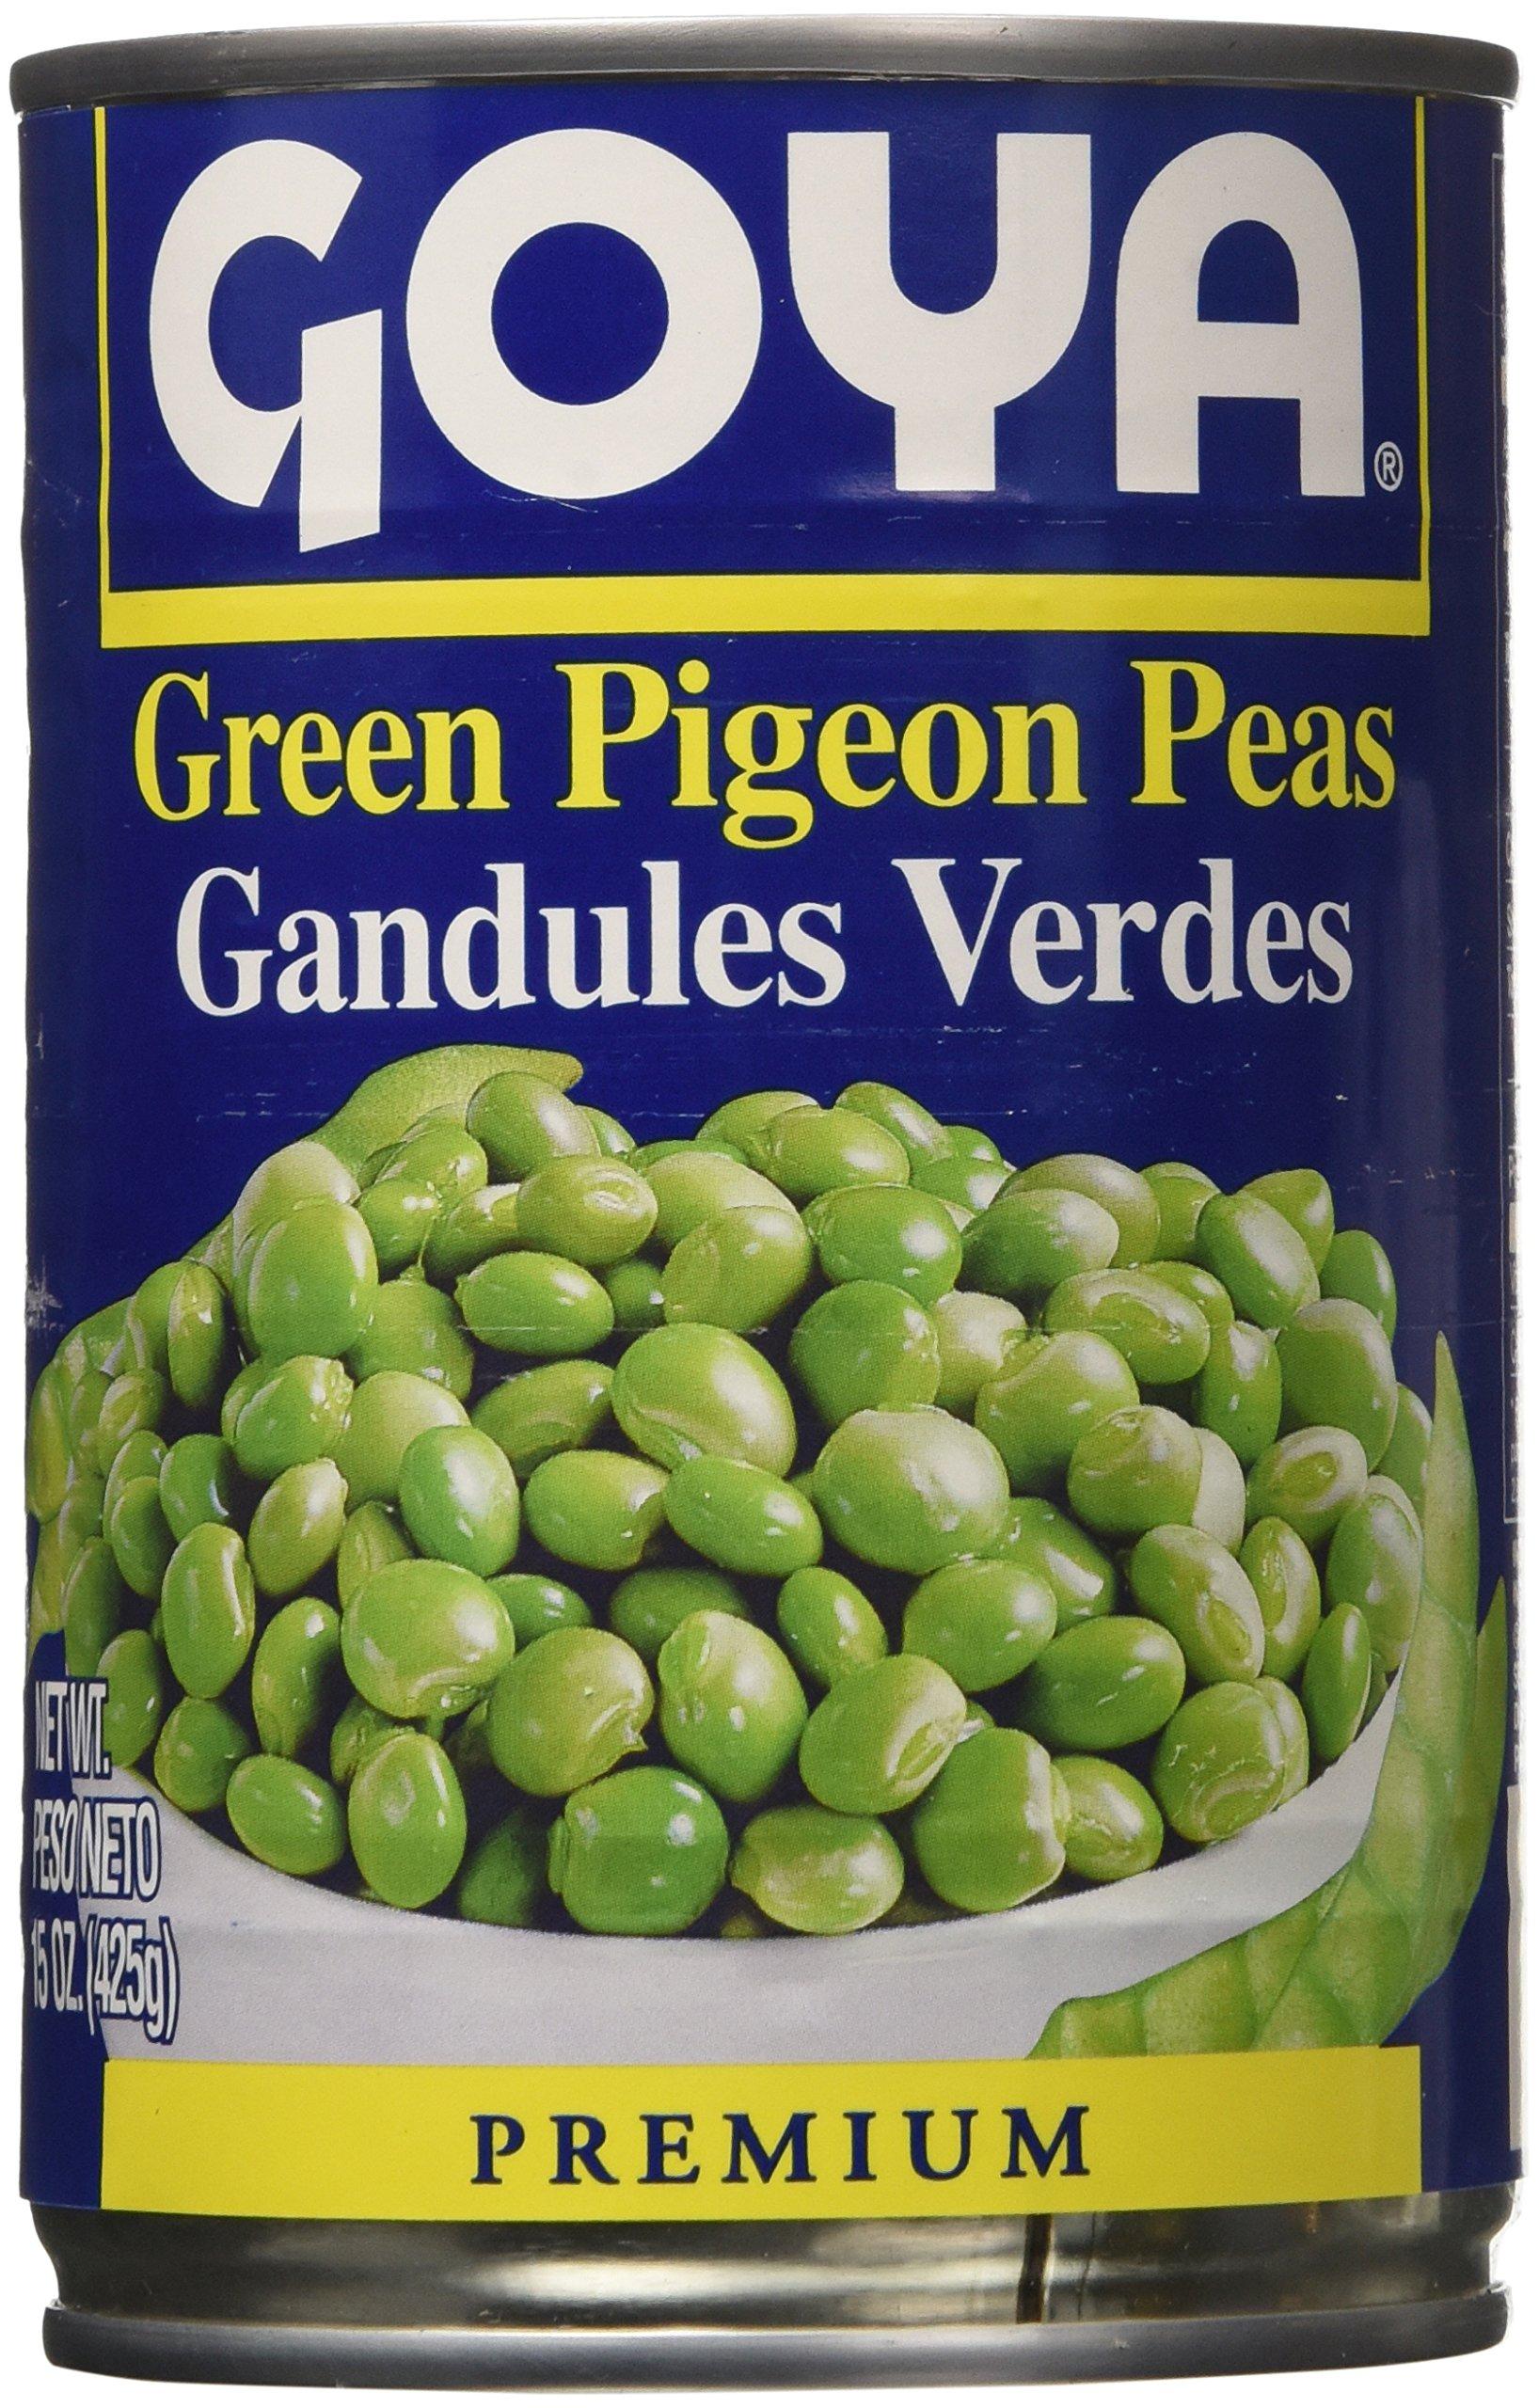 Goya Green Pigeon Peas-15 Ounce, 6 Count